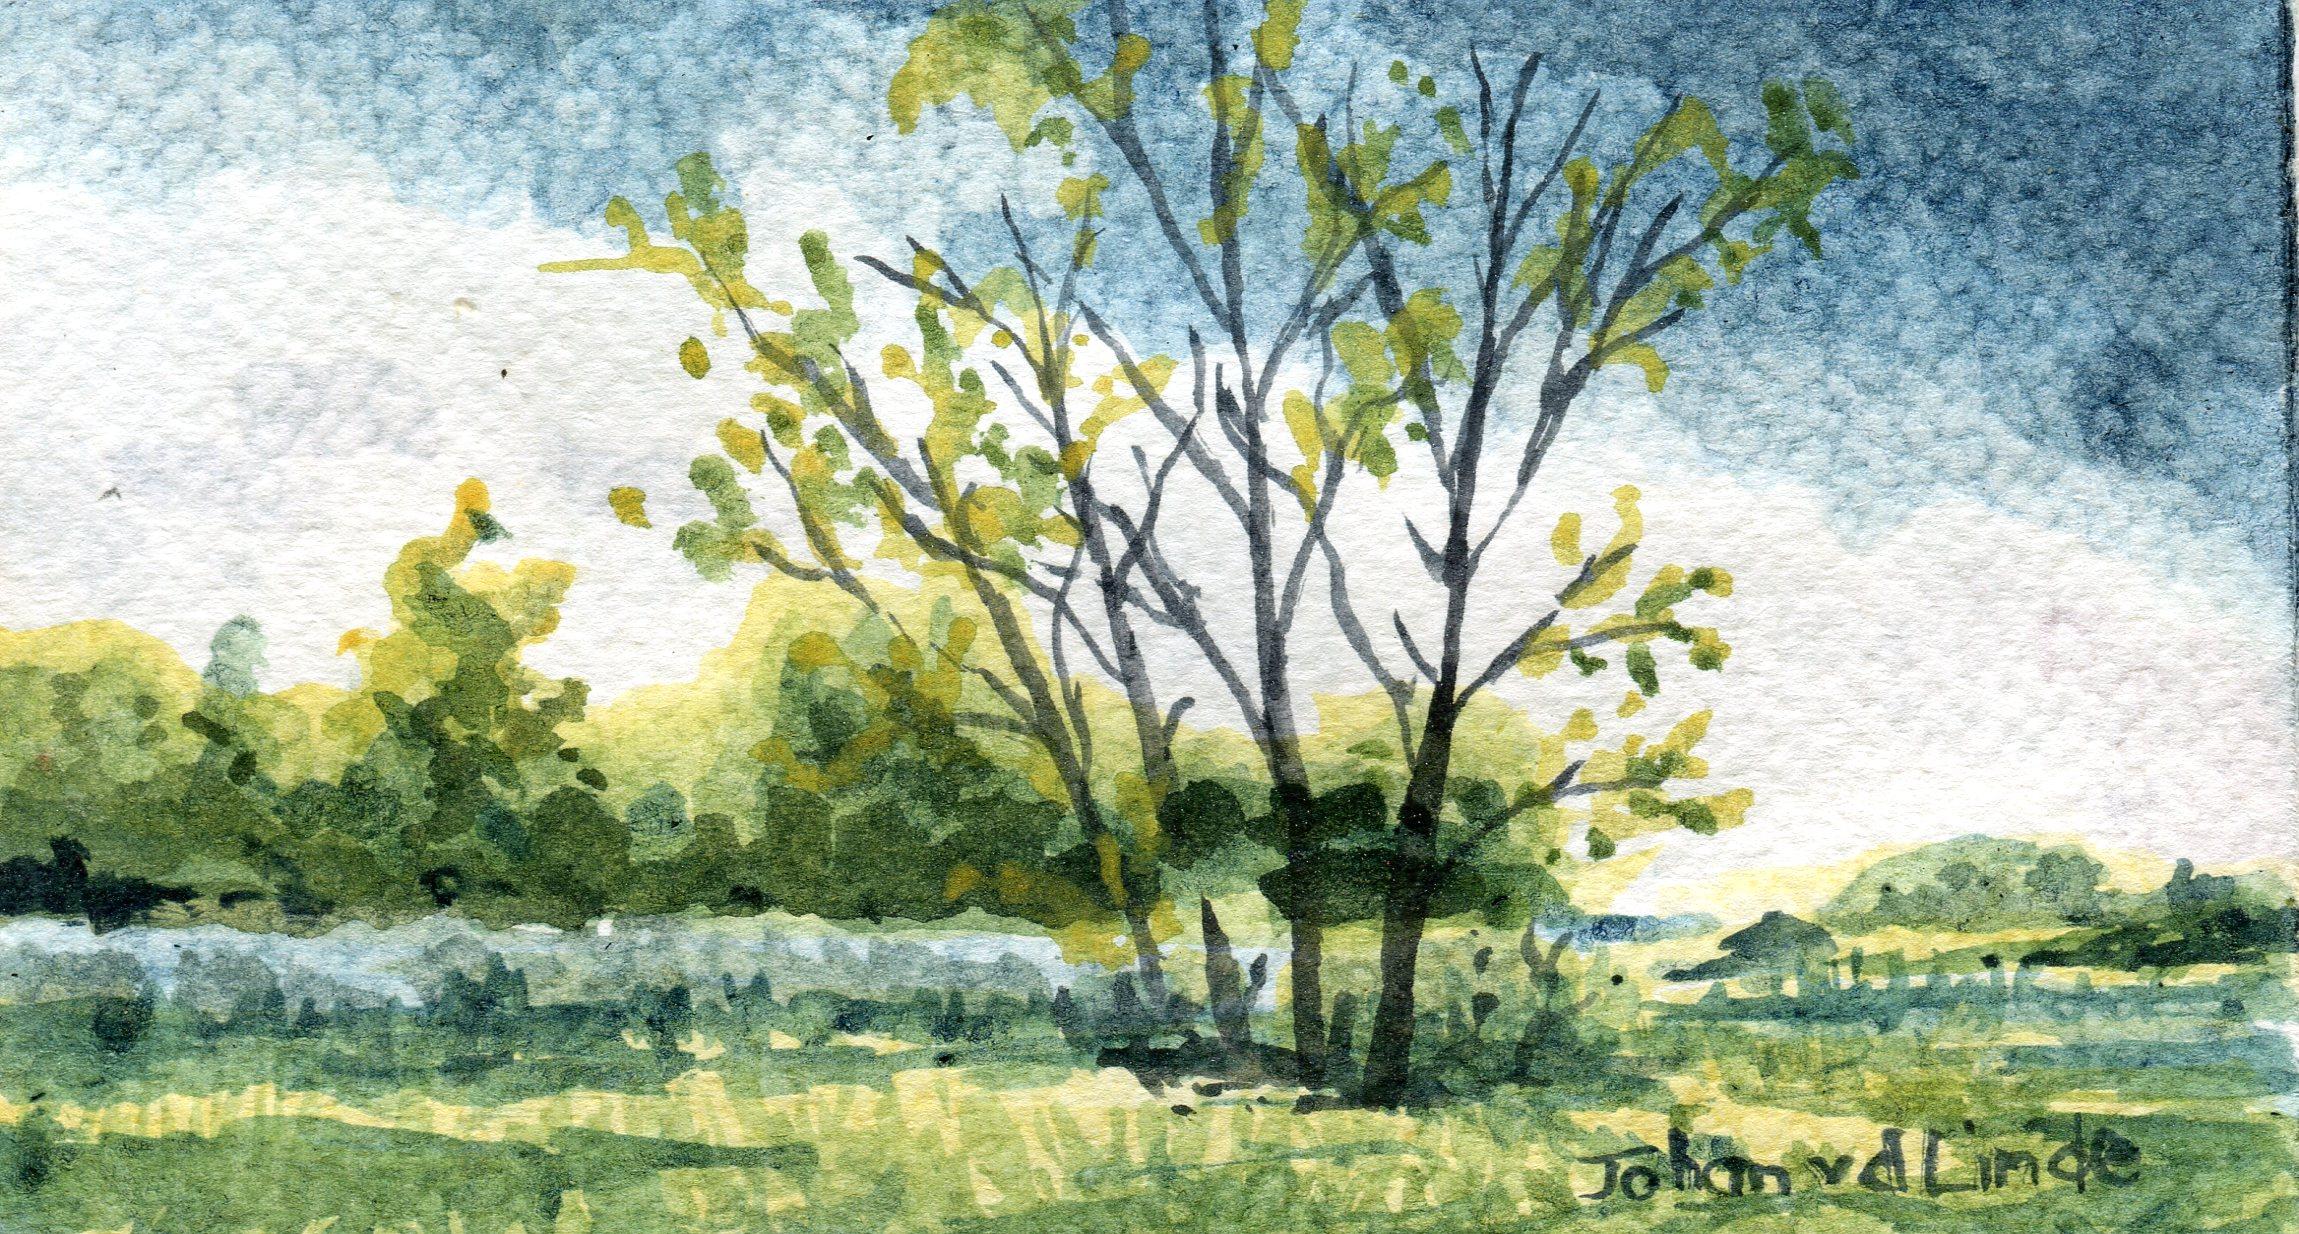 40b  Johan van der Linde  Trees- Symmonds Lane, Howick  watercolour on paper